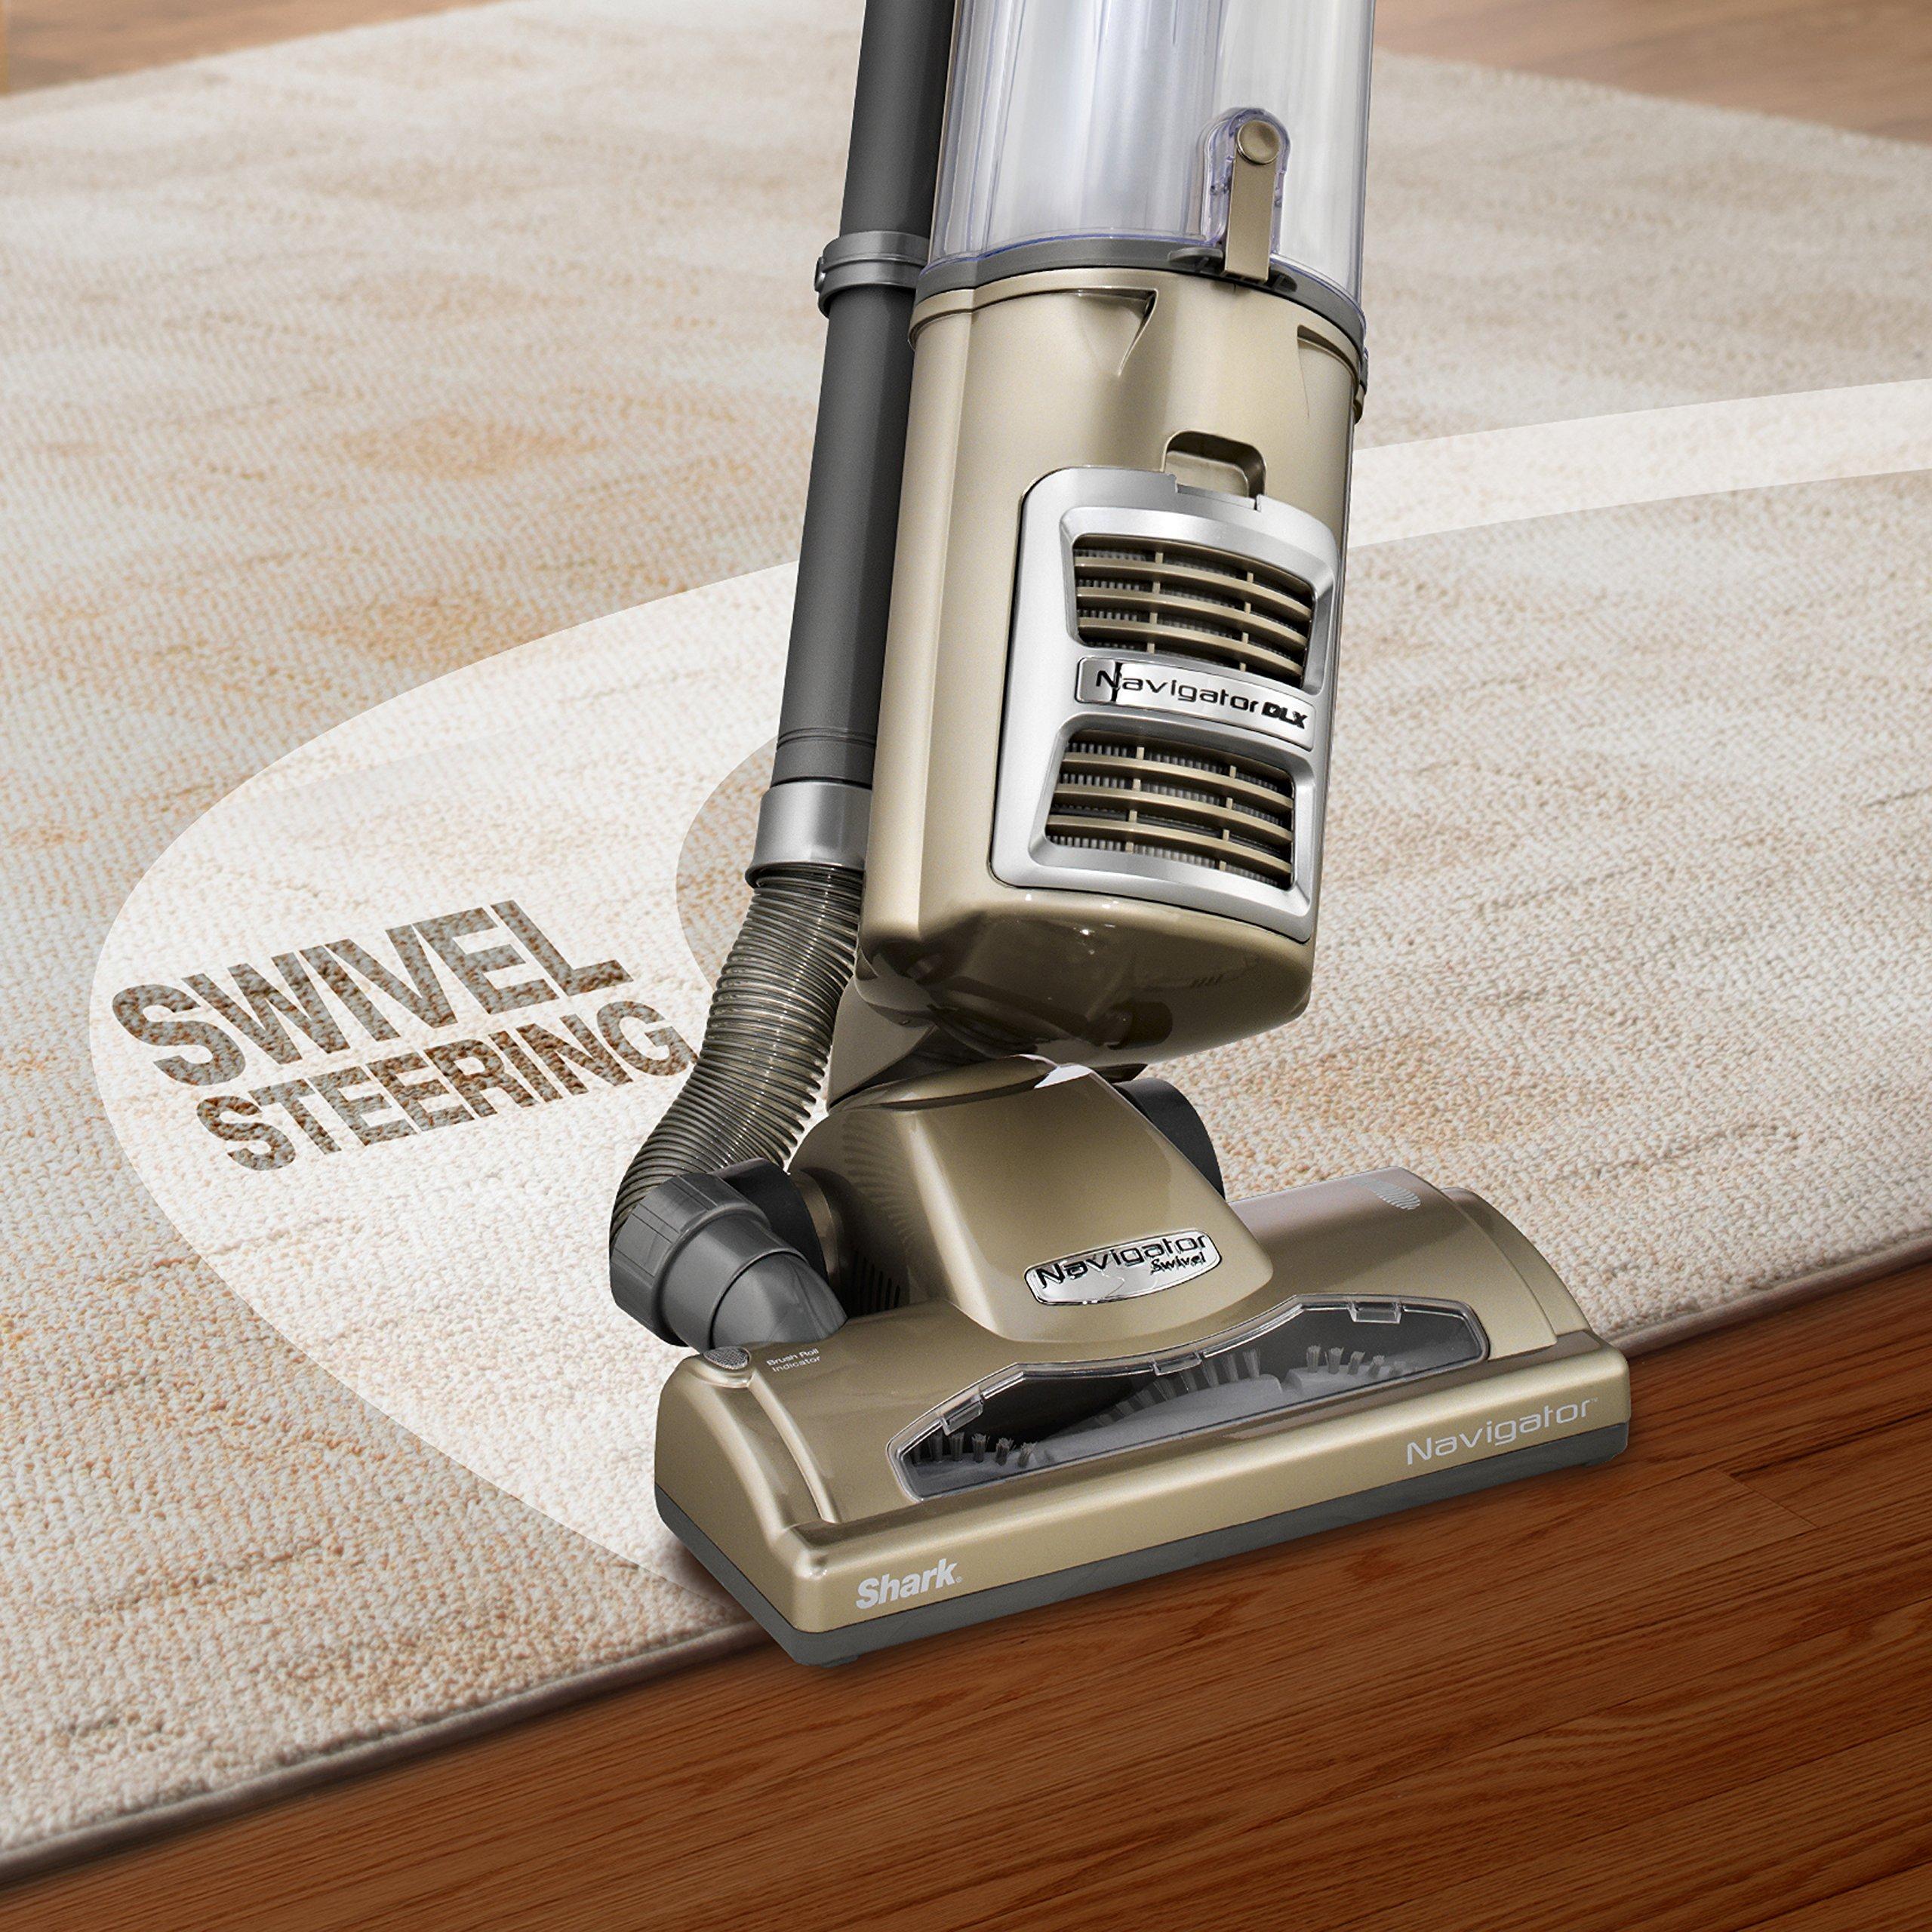 Shark Navigator Professional Upright Vacuum, Gold and Silver (NV70) by SharkNinja (Image #2)